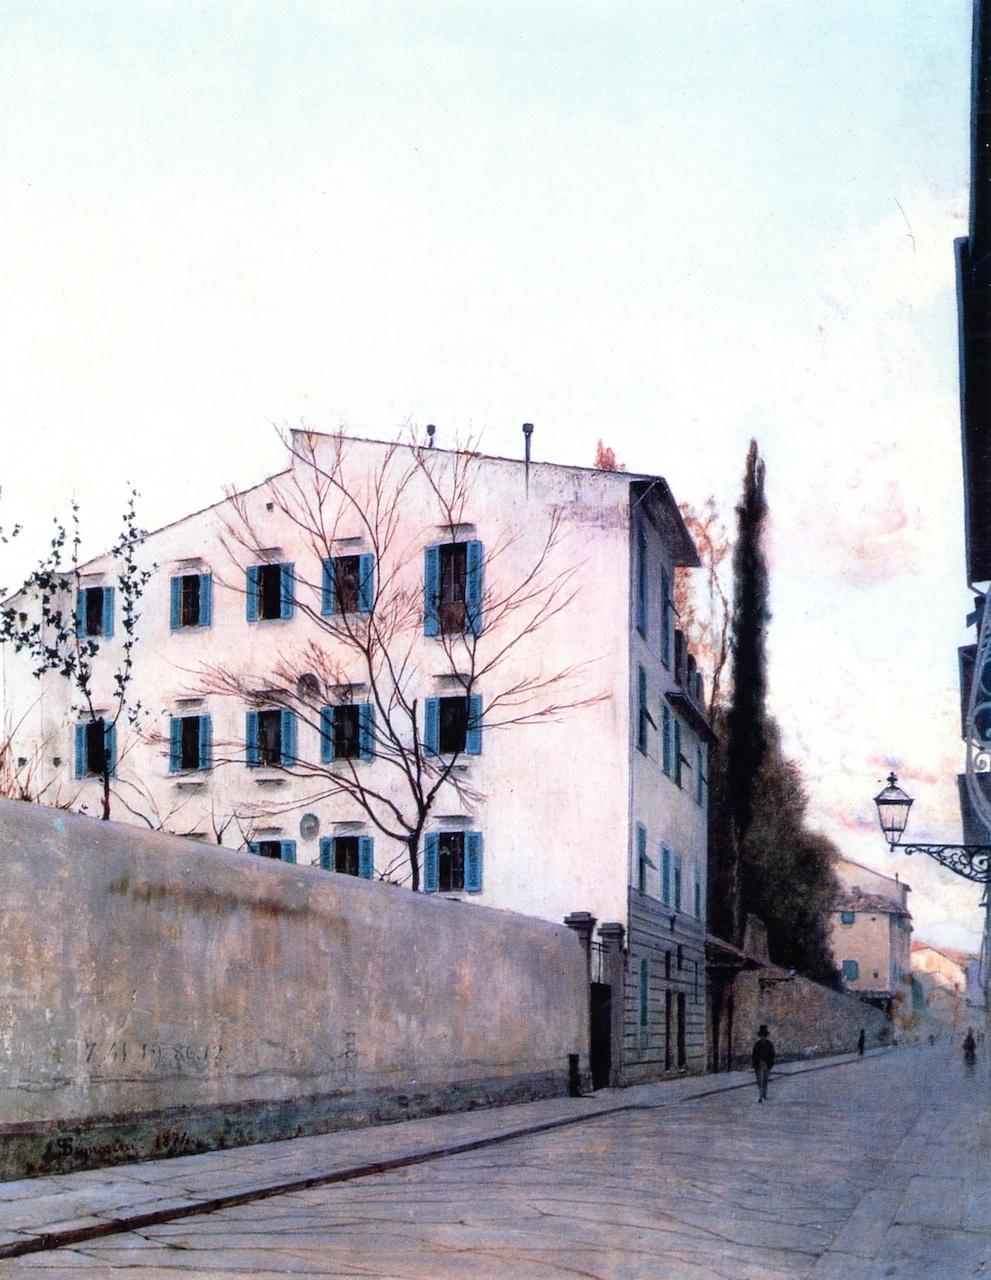 Telemaco Signorini. Landscape